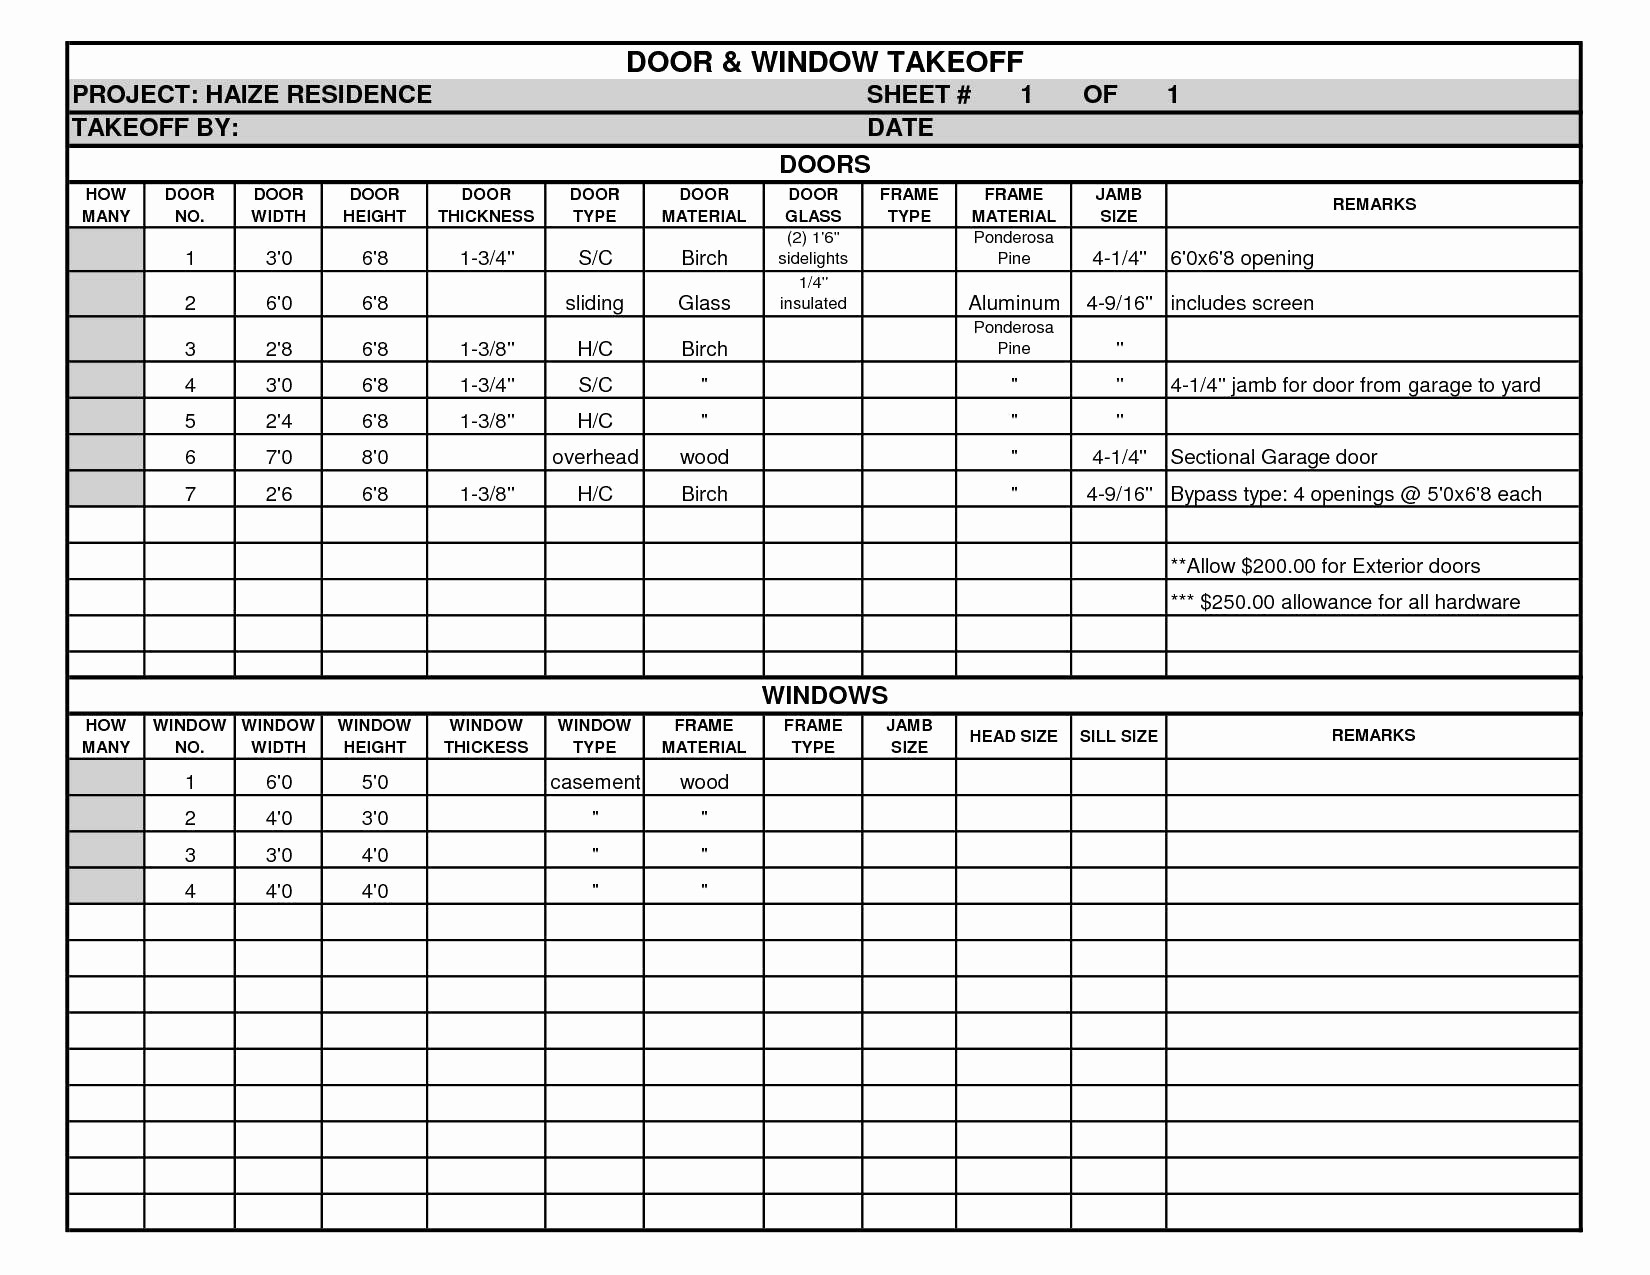 Steel Estimating Spreadsheet Best Of Piping Takeoff Spreadsheet In Piping Takeoff Spreadsheet